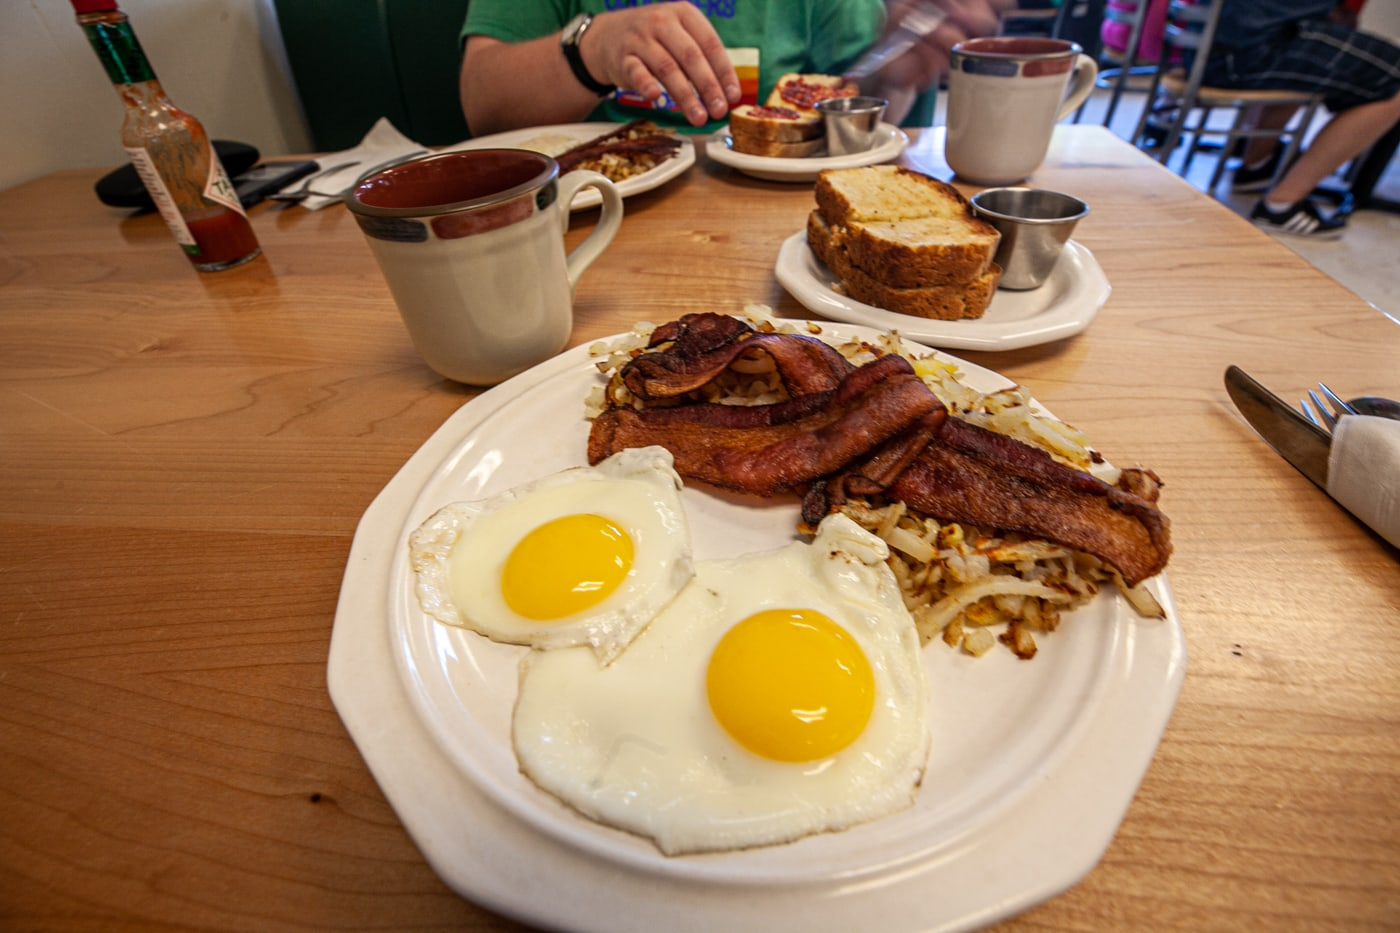 Breakfast at Karina's in Whitehall, Montana.